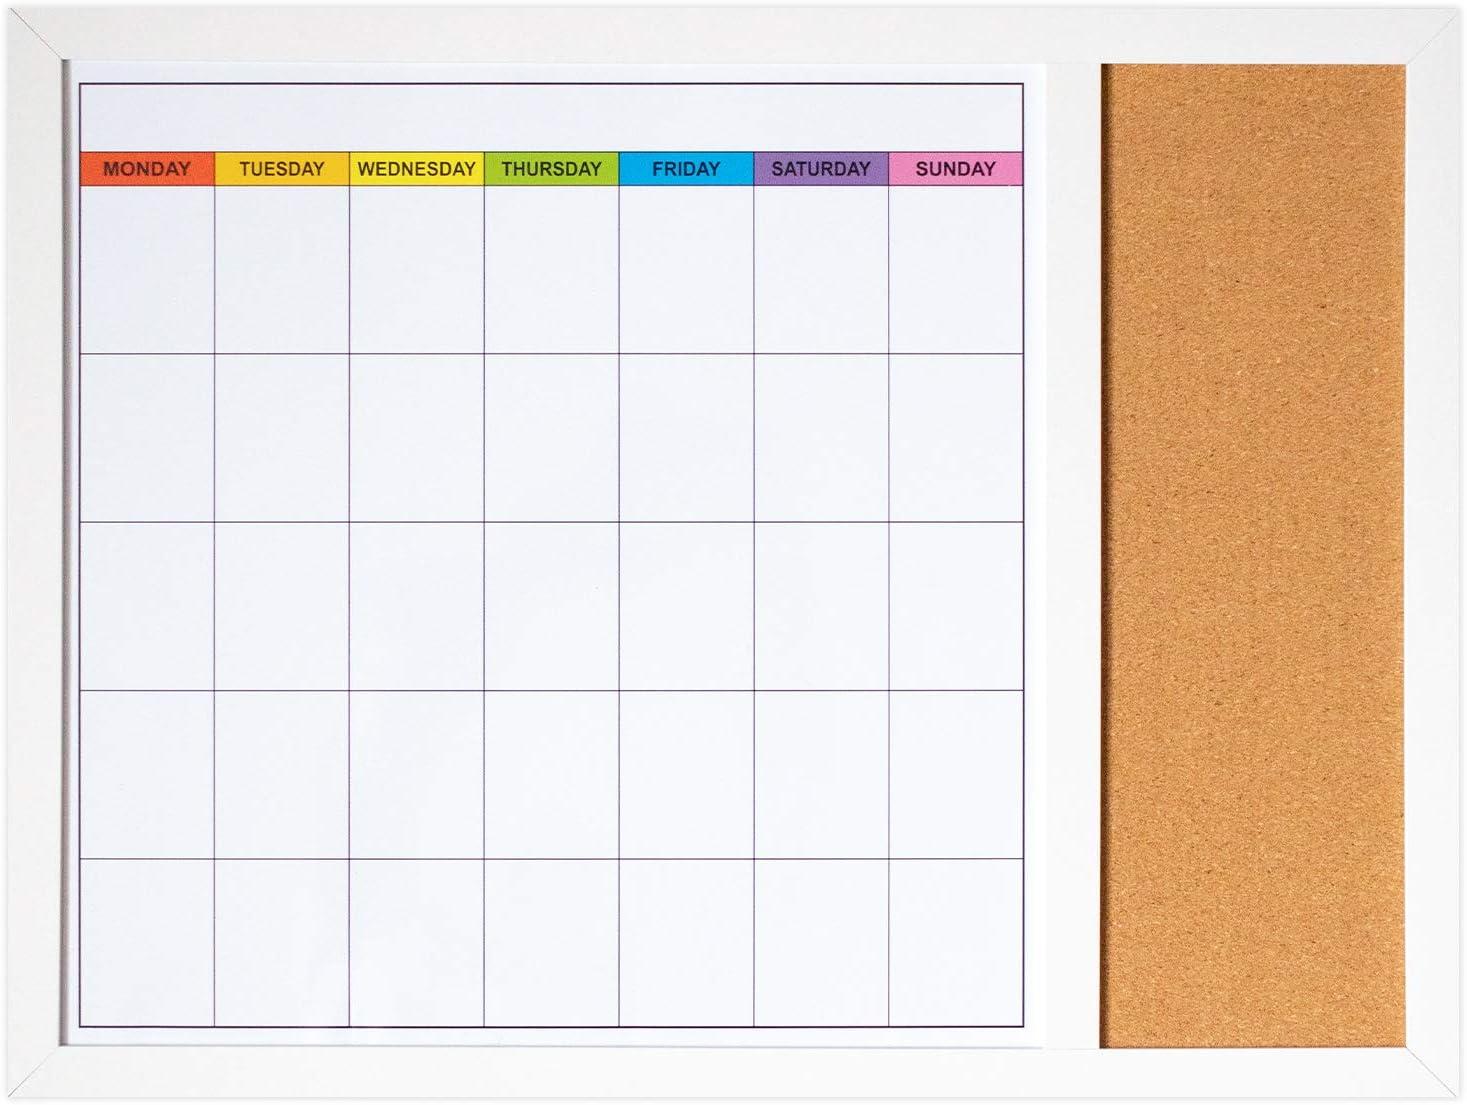 Dry Erase Calendar Board for Wall (18in x 24in) - Magnetic Whiteboard Calendar with Small Cork Board - White Board Dry Erase Monthly Calendar and Notes - Wood Framed Calendar Whiteboard